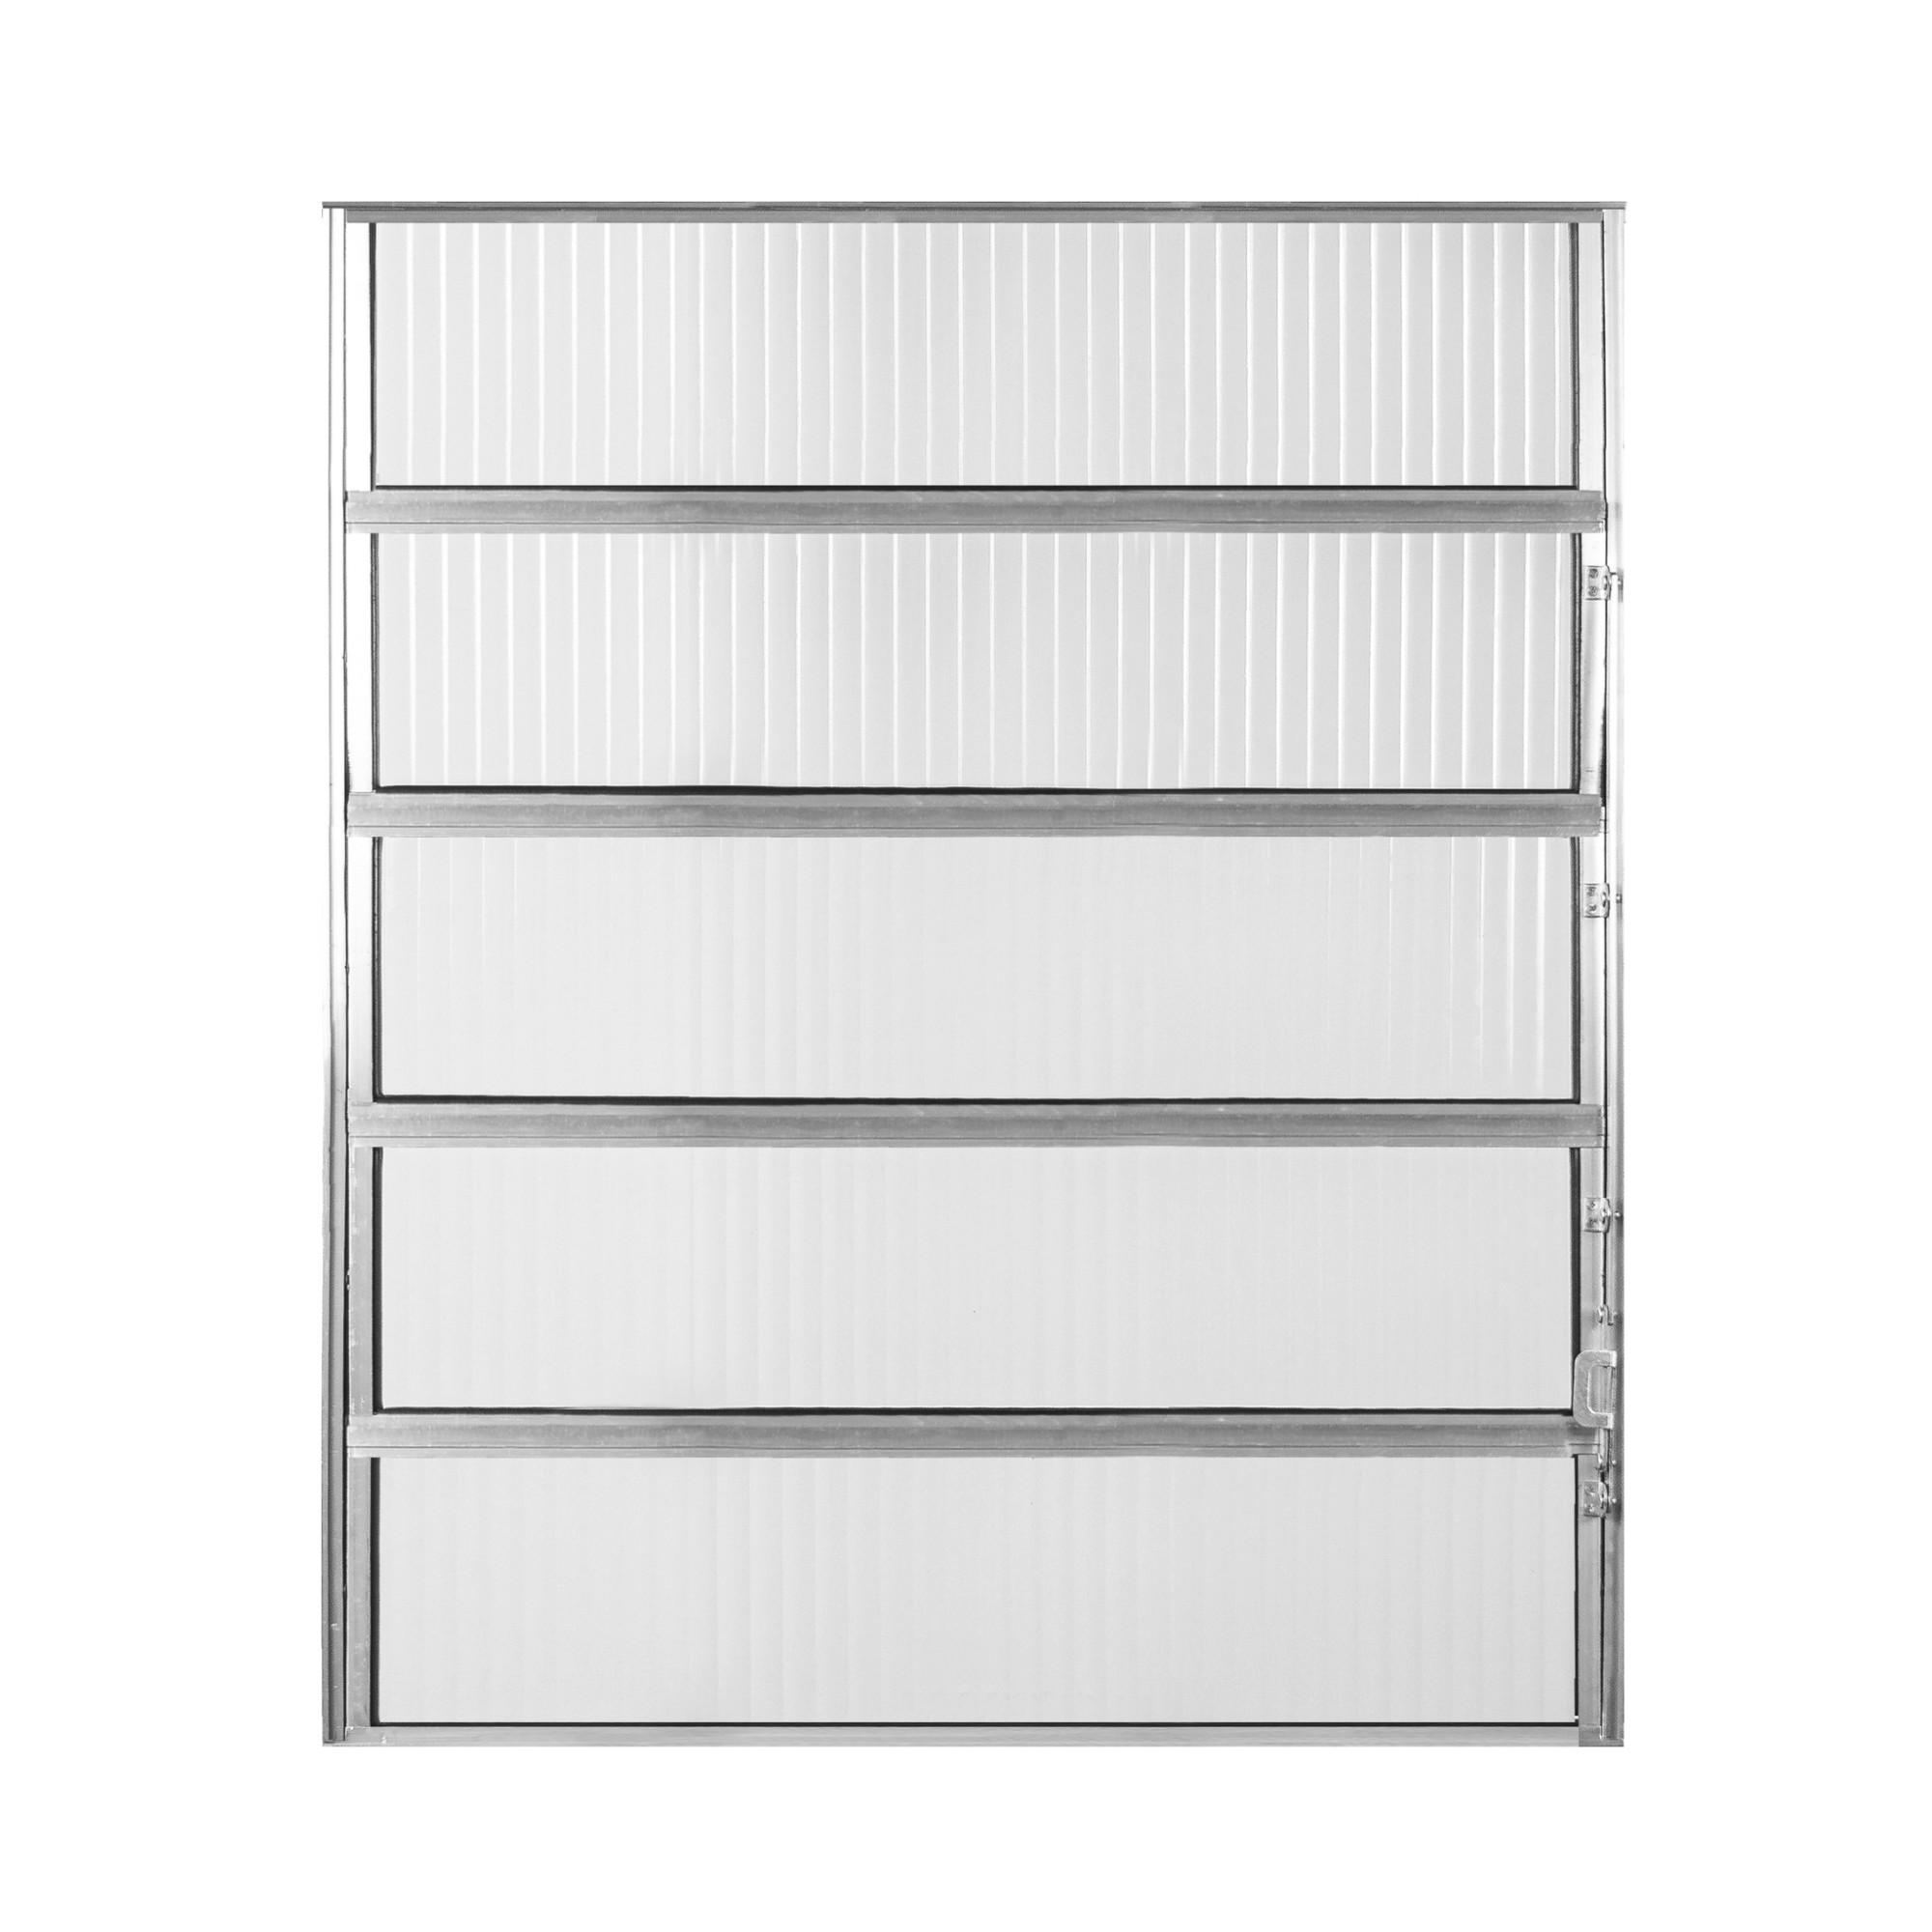 Janela de Abrir Basculante de Aluminio Vidro Canelado 100x80 cm Cinza - Aluvid